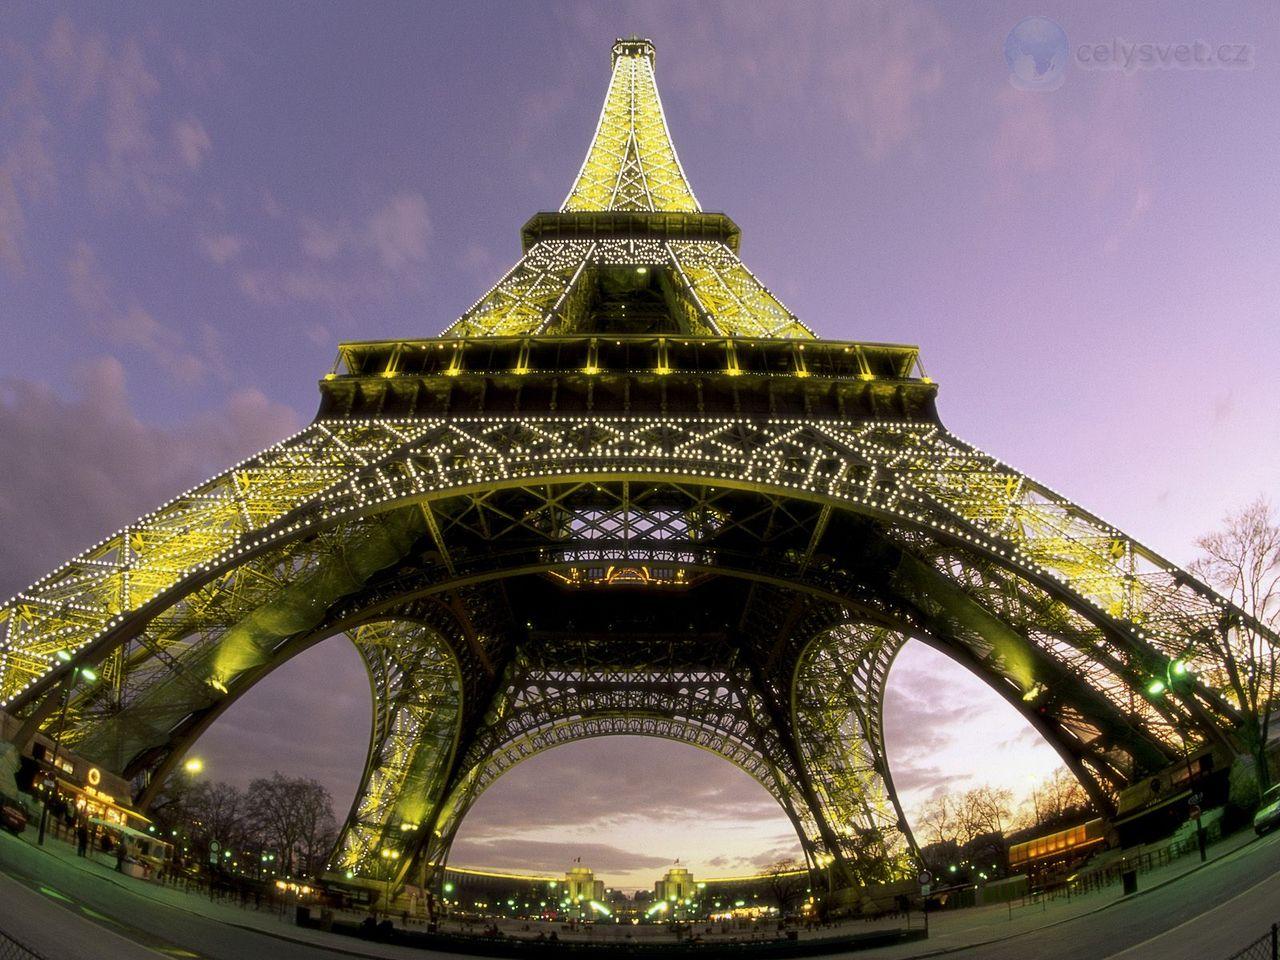 Eiffelova Věž Zespodu Pař 237 ž Francie Eiffel Tower From